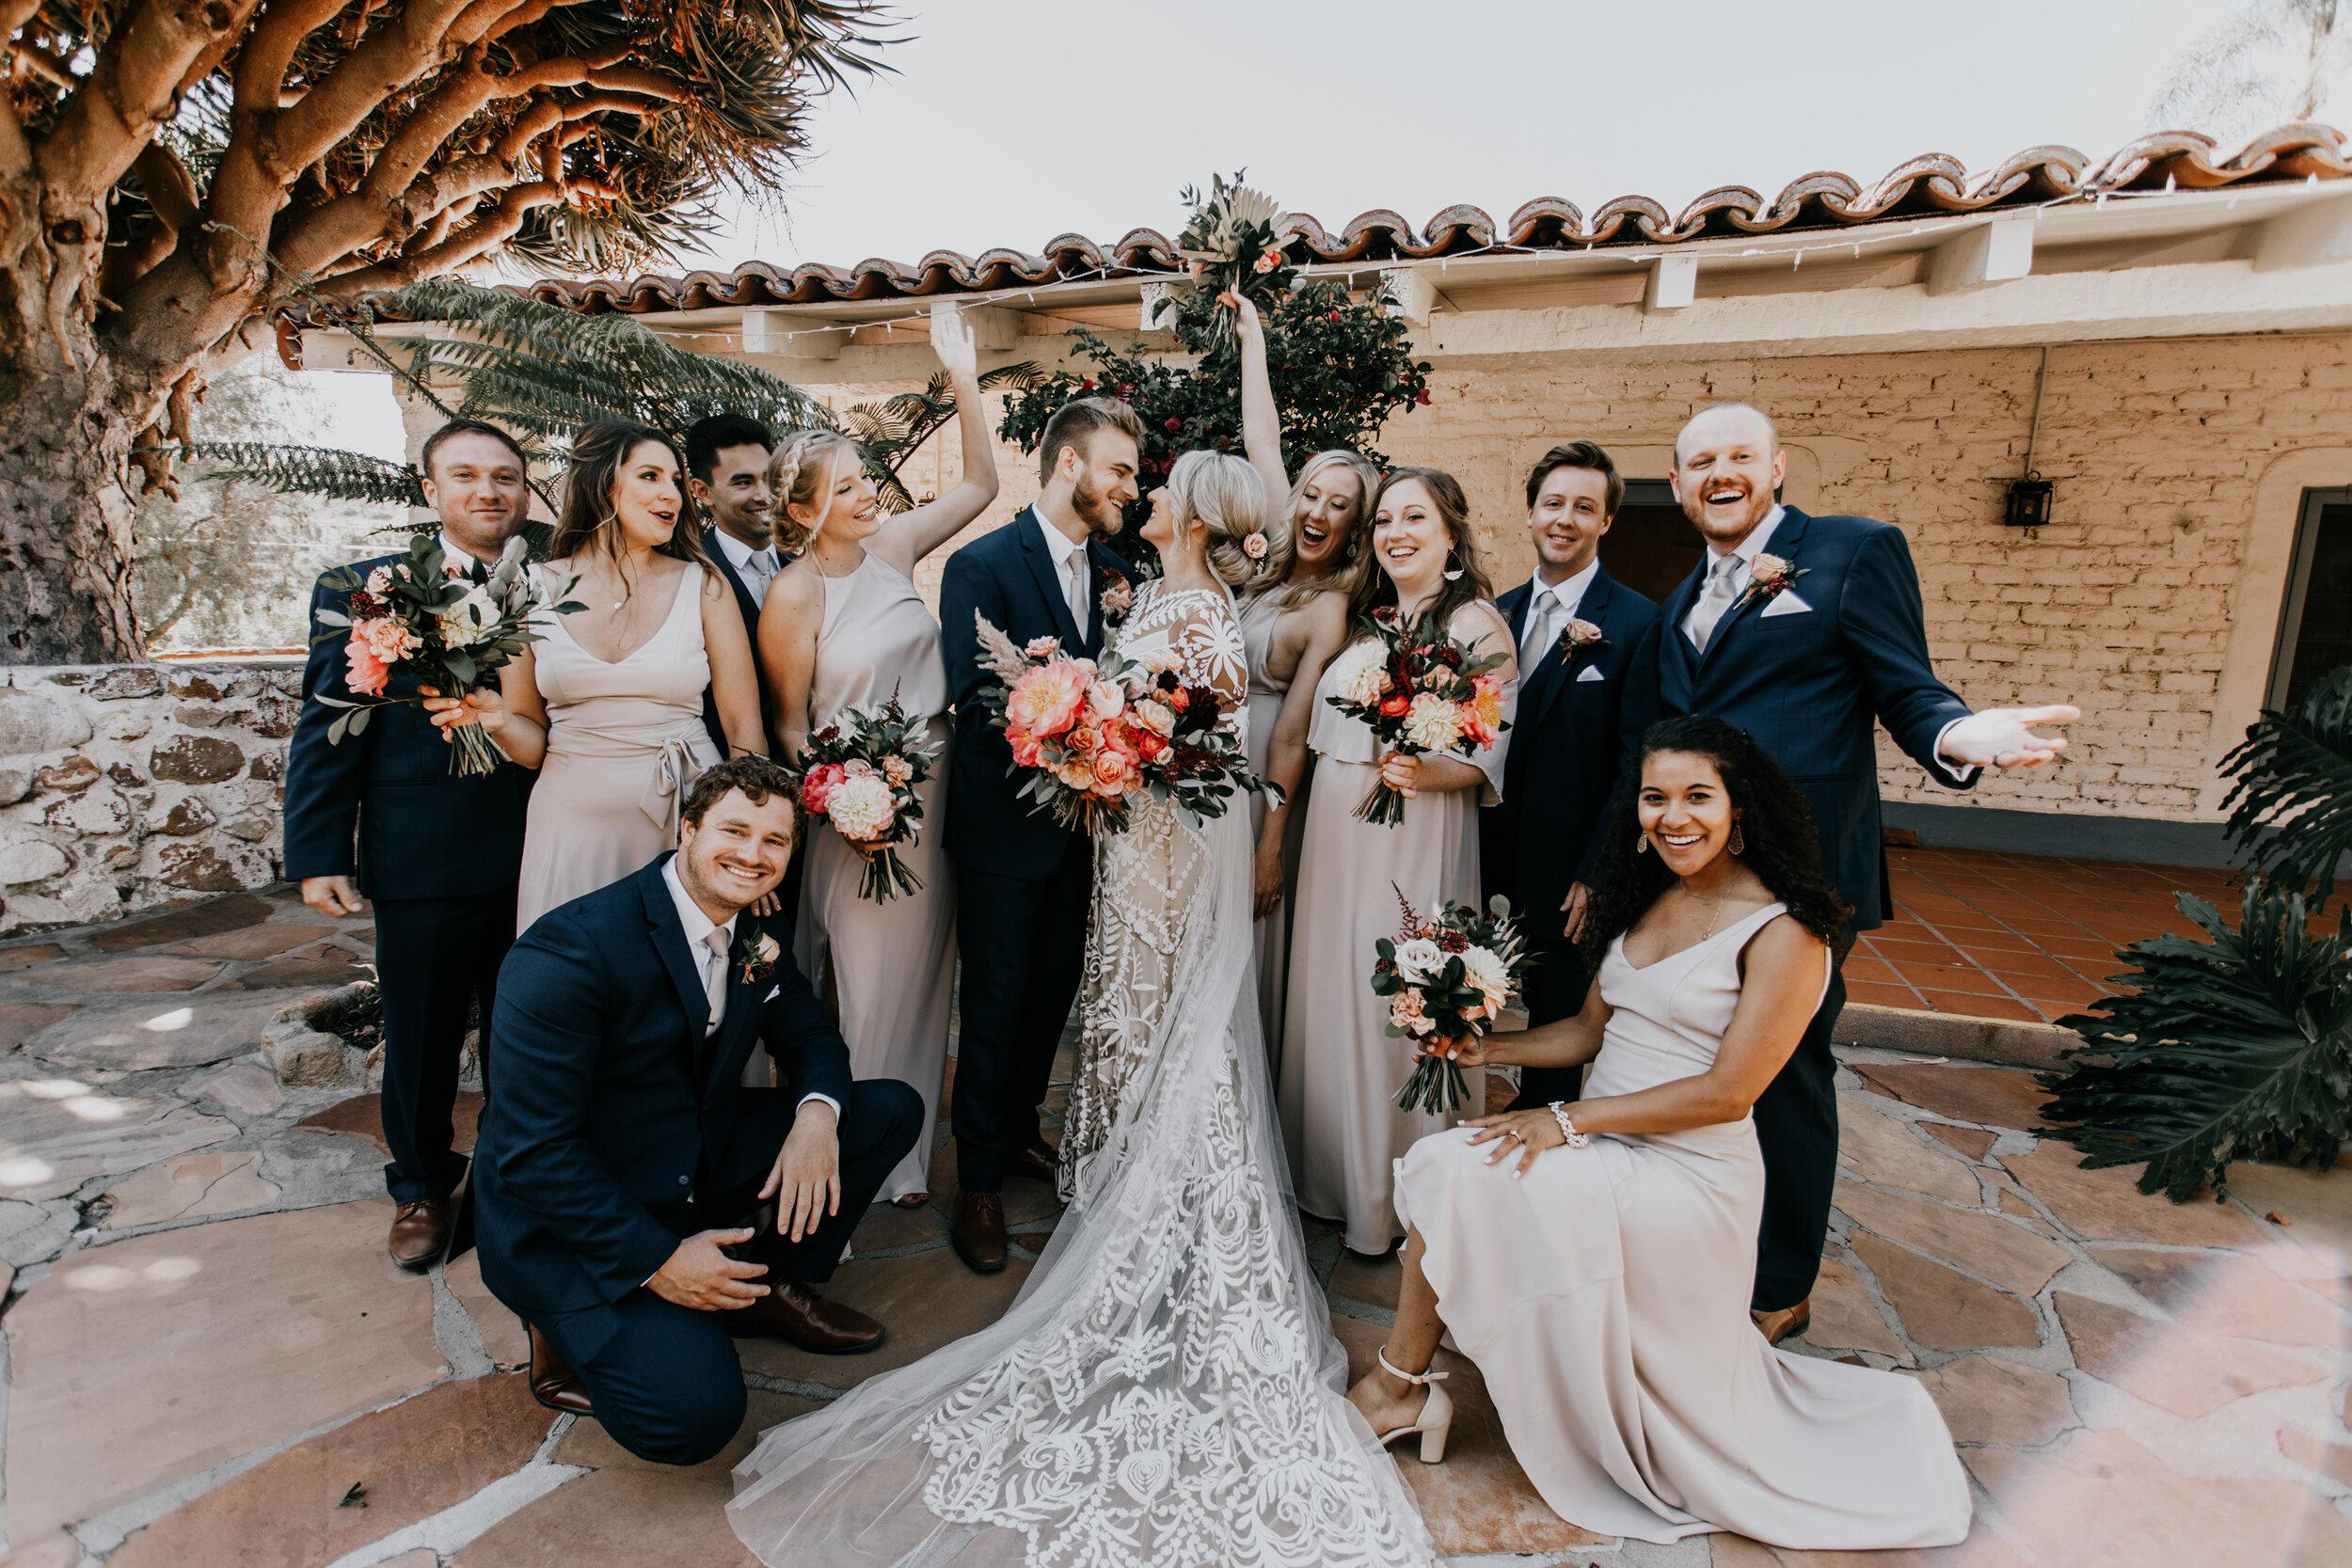 weddingcelebration.jpg